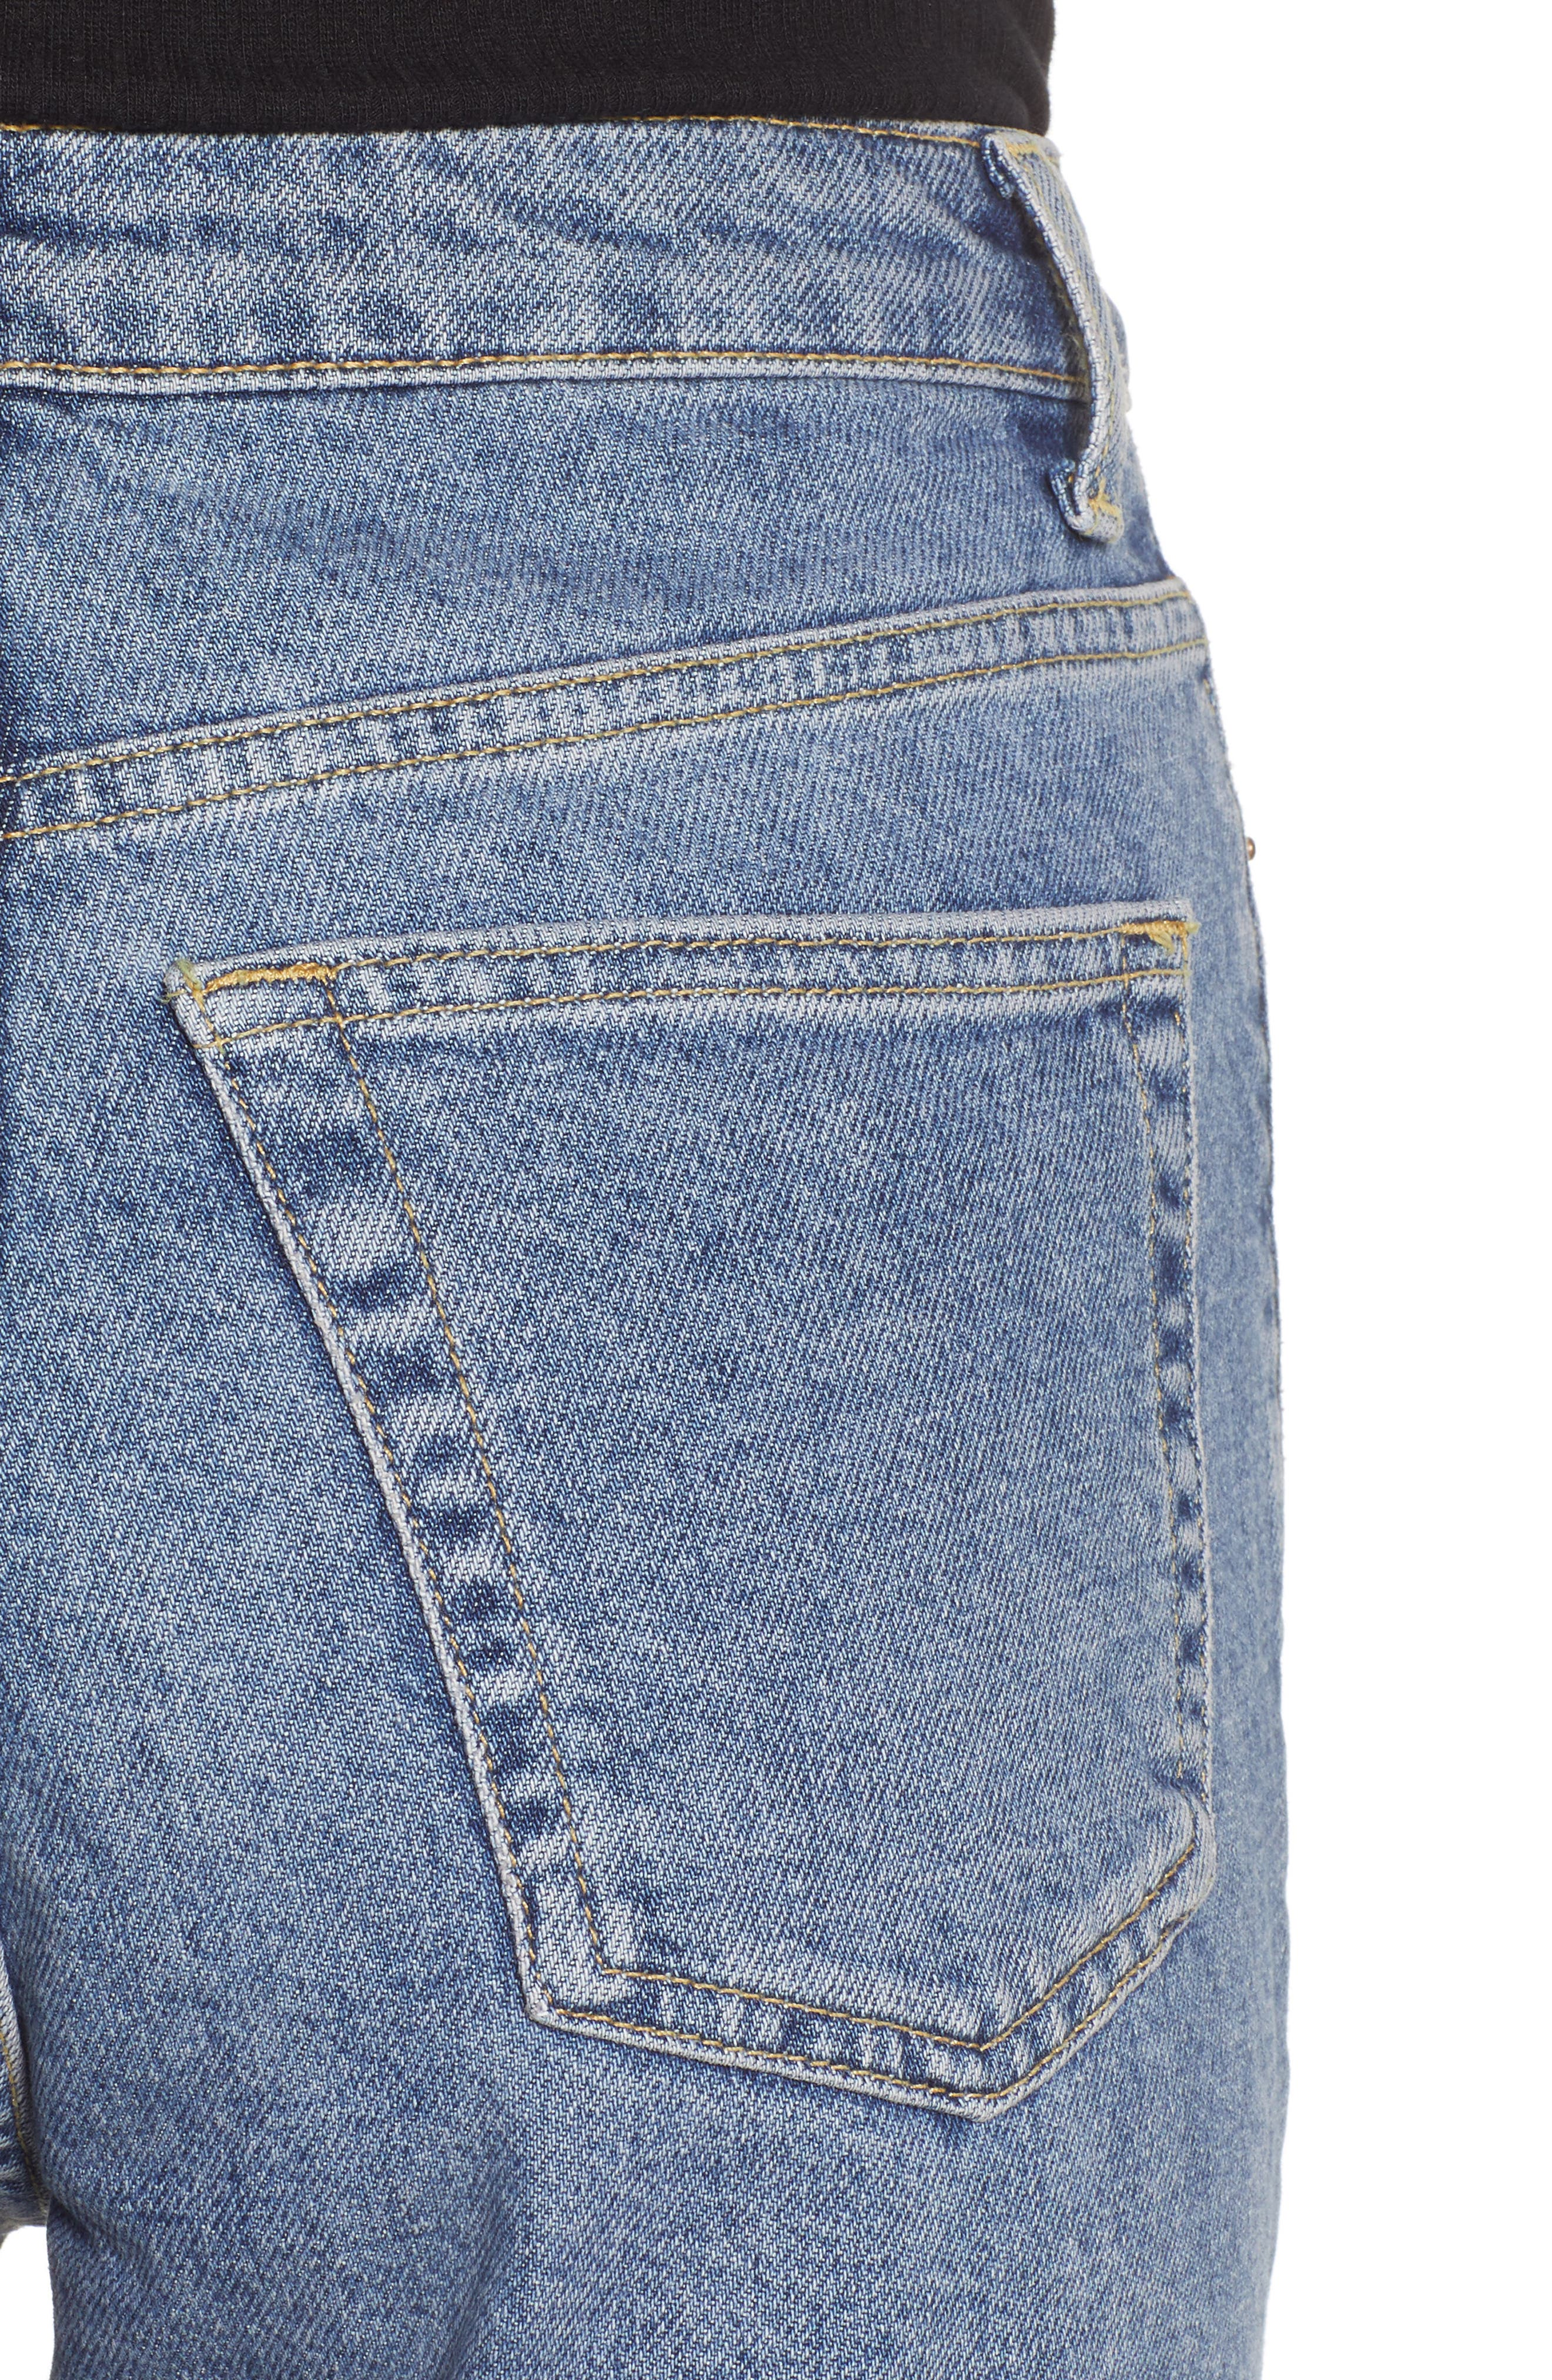 TOPSHOP, Raw Hem Straight Leg Jeans, Alternate thumbnail 5, color, MID BLUE